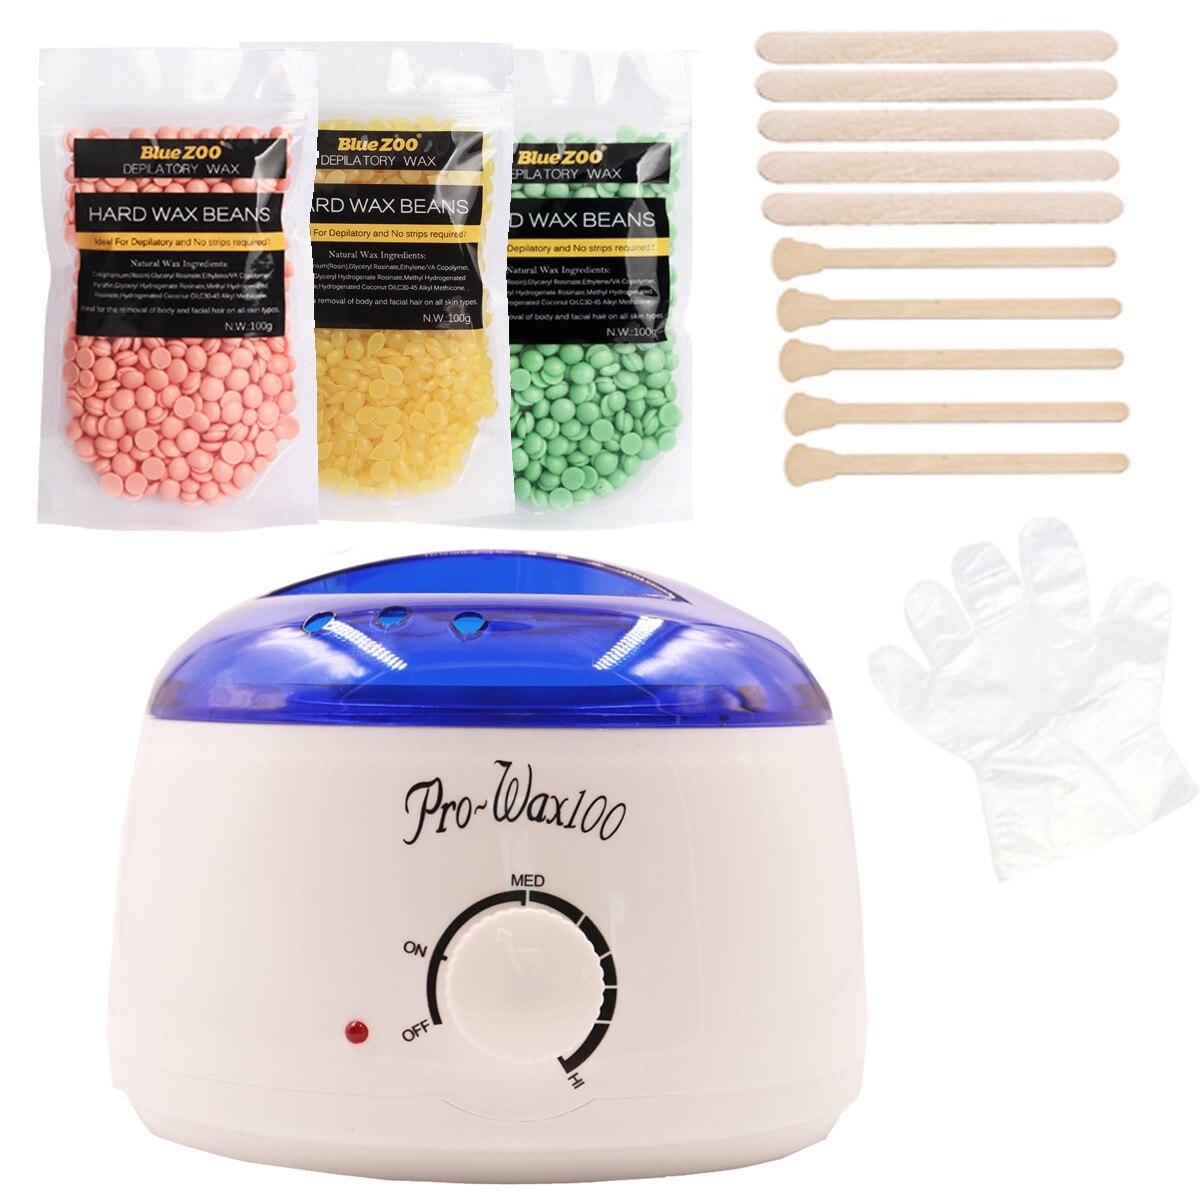 Brazilian Wax Heater 500ML Hair Removal Machine Hard Wax Beans Epilator 3*100g Pearl Wax With Wooden Spatulas Epilation Set eseewigs 100g pc 1 3 hair bundle with closure